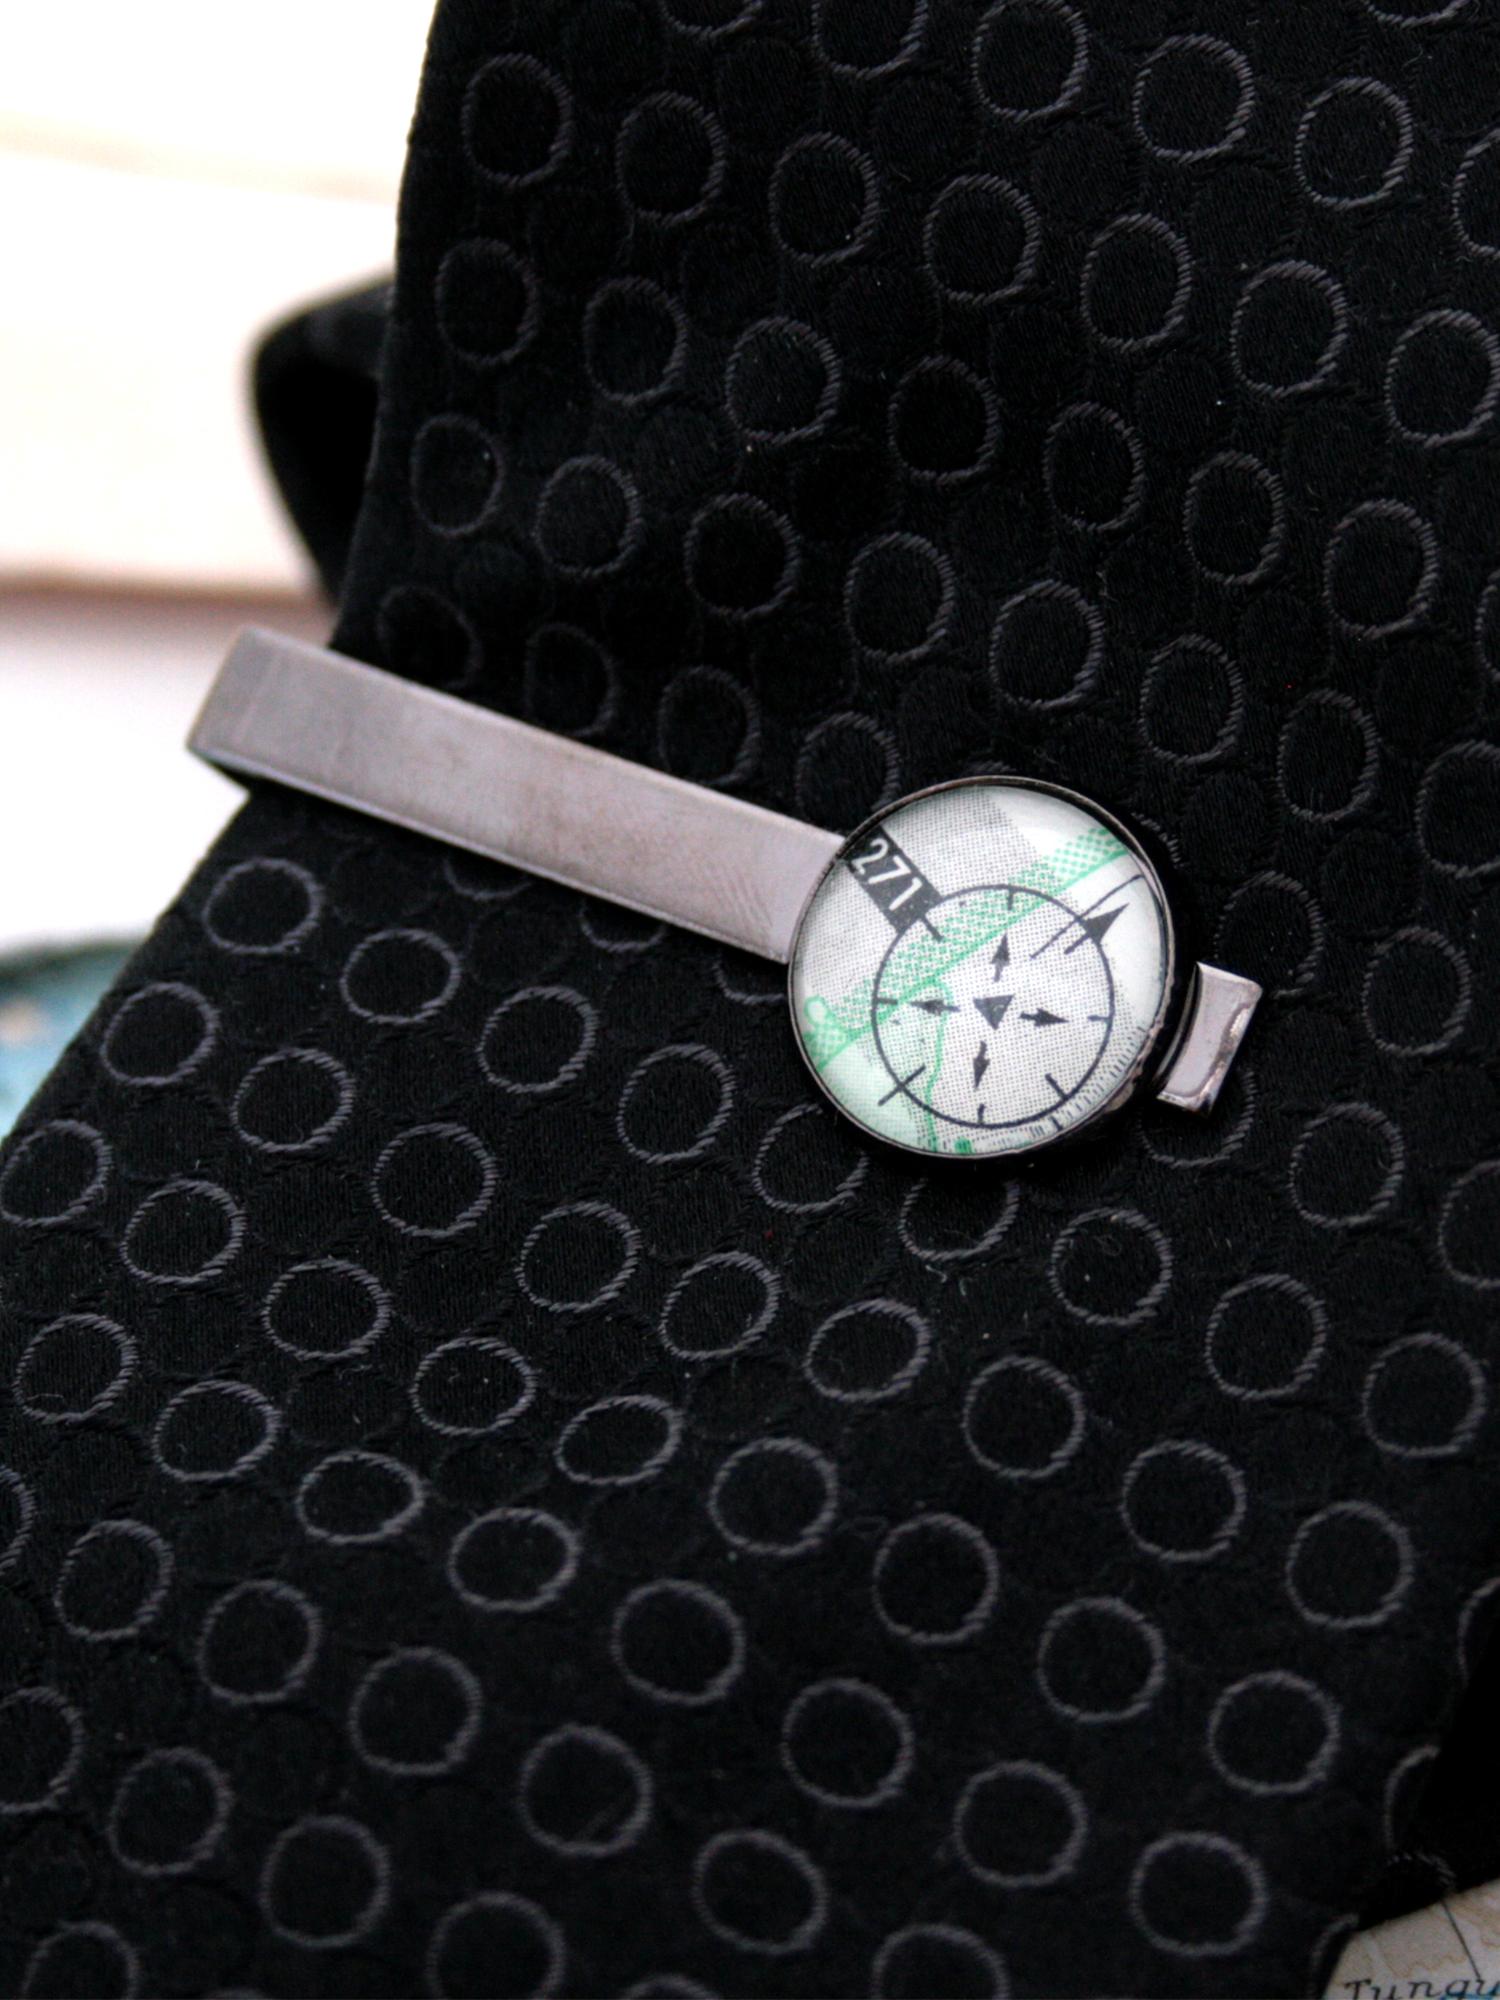 aviation tie clip for a pilot